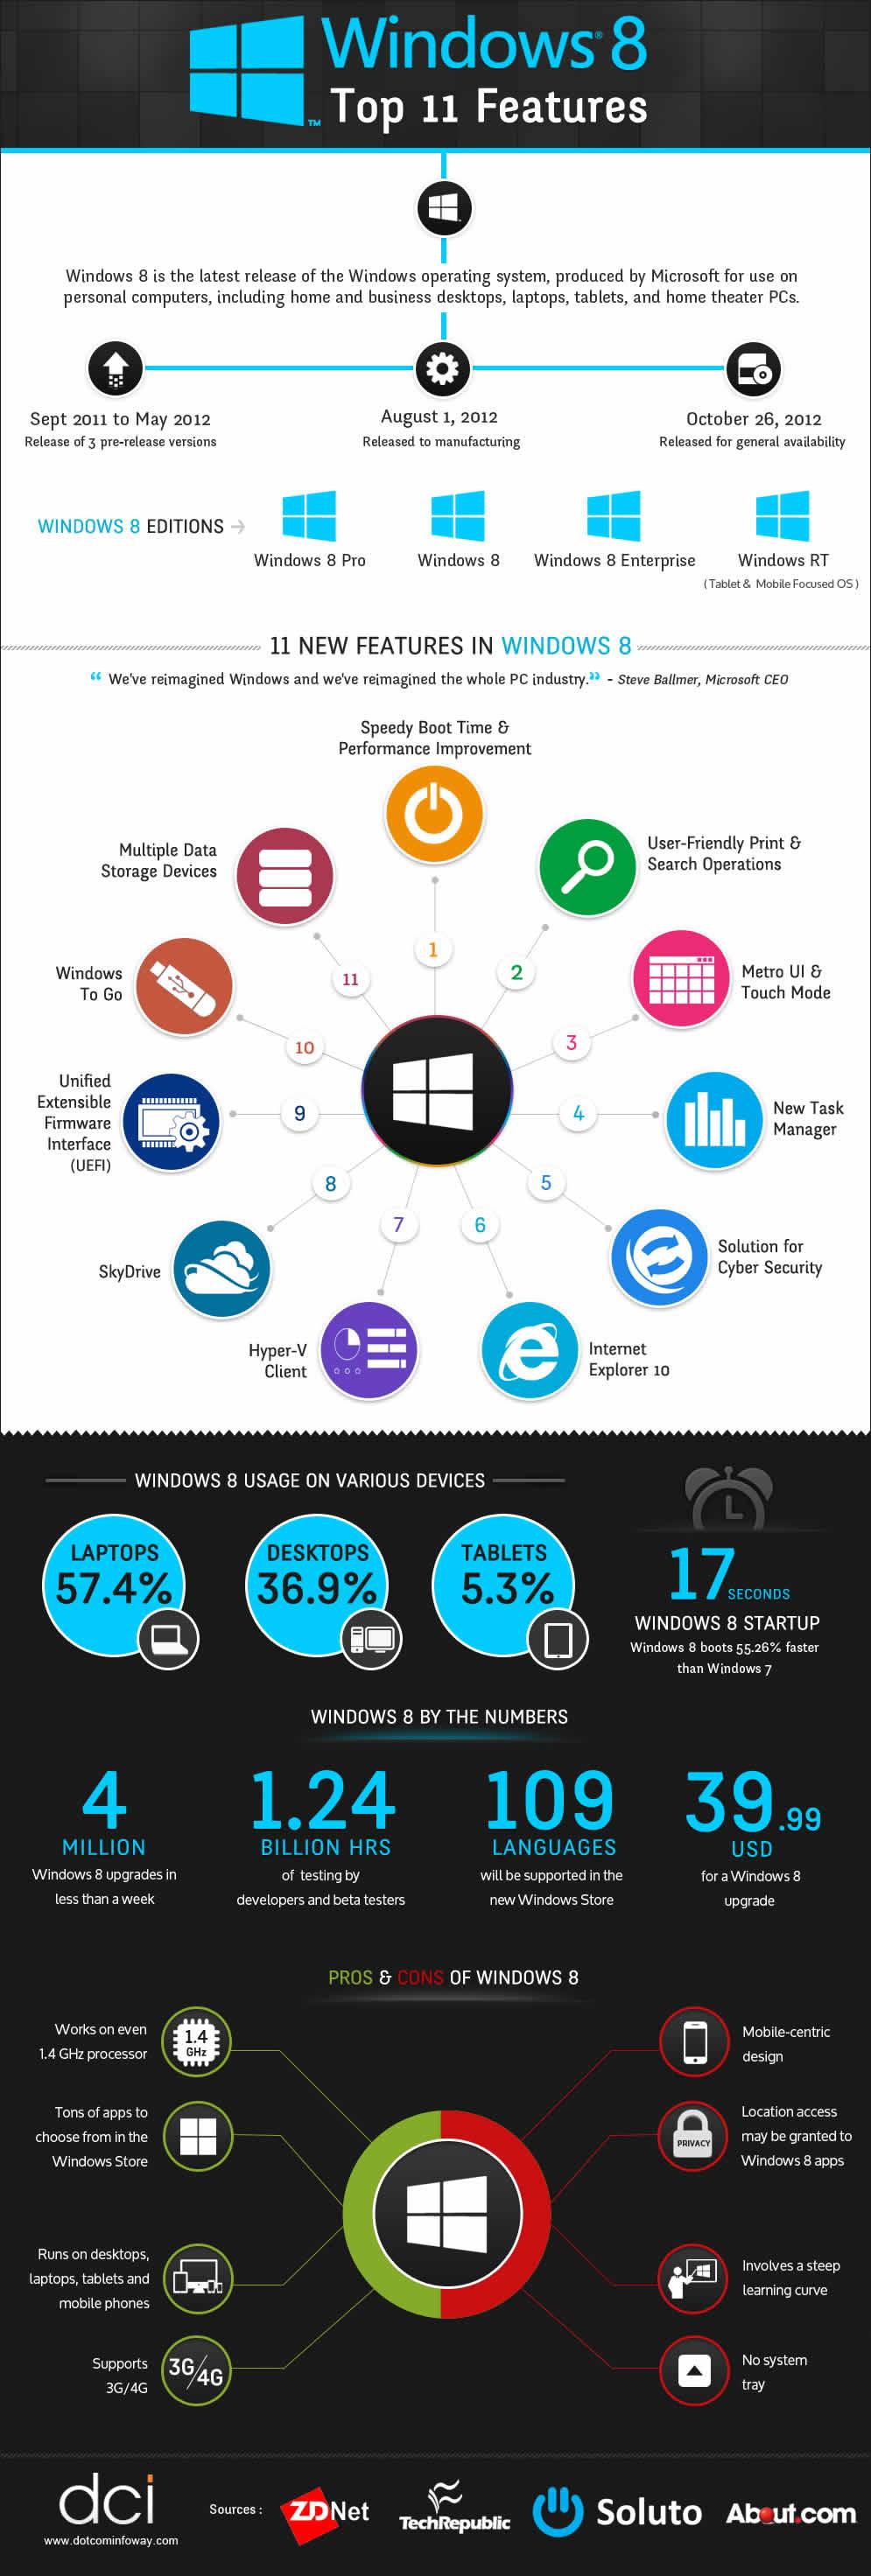 windows-8-top-11-features_50b86e4ac4151